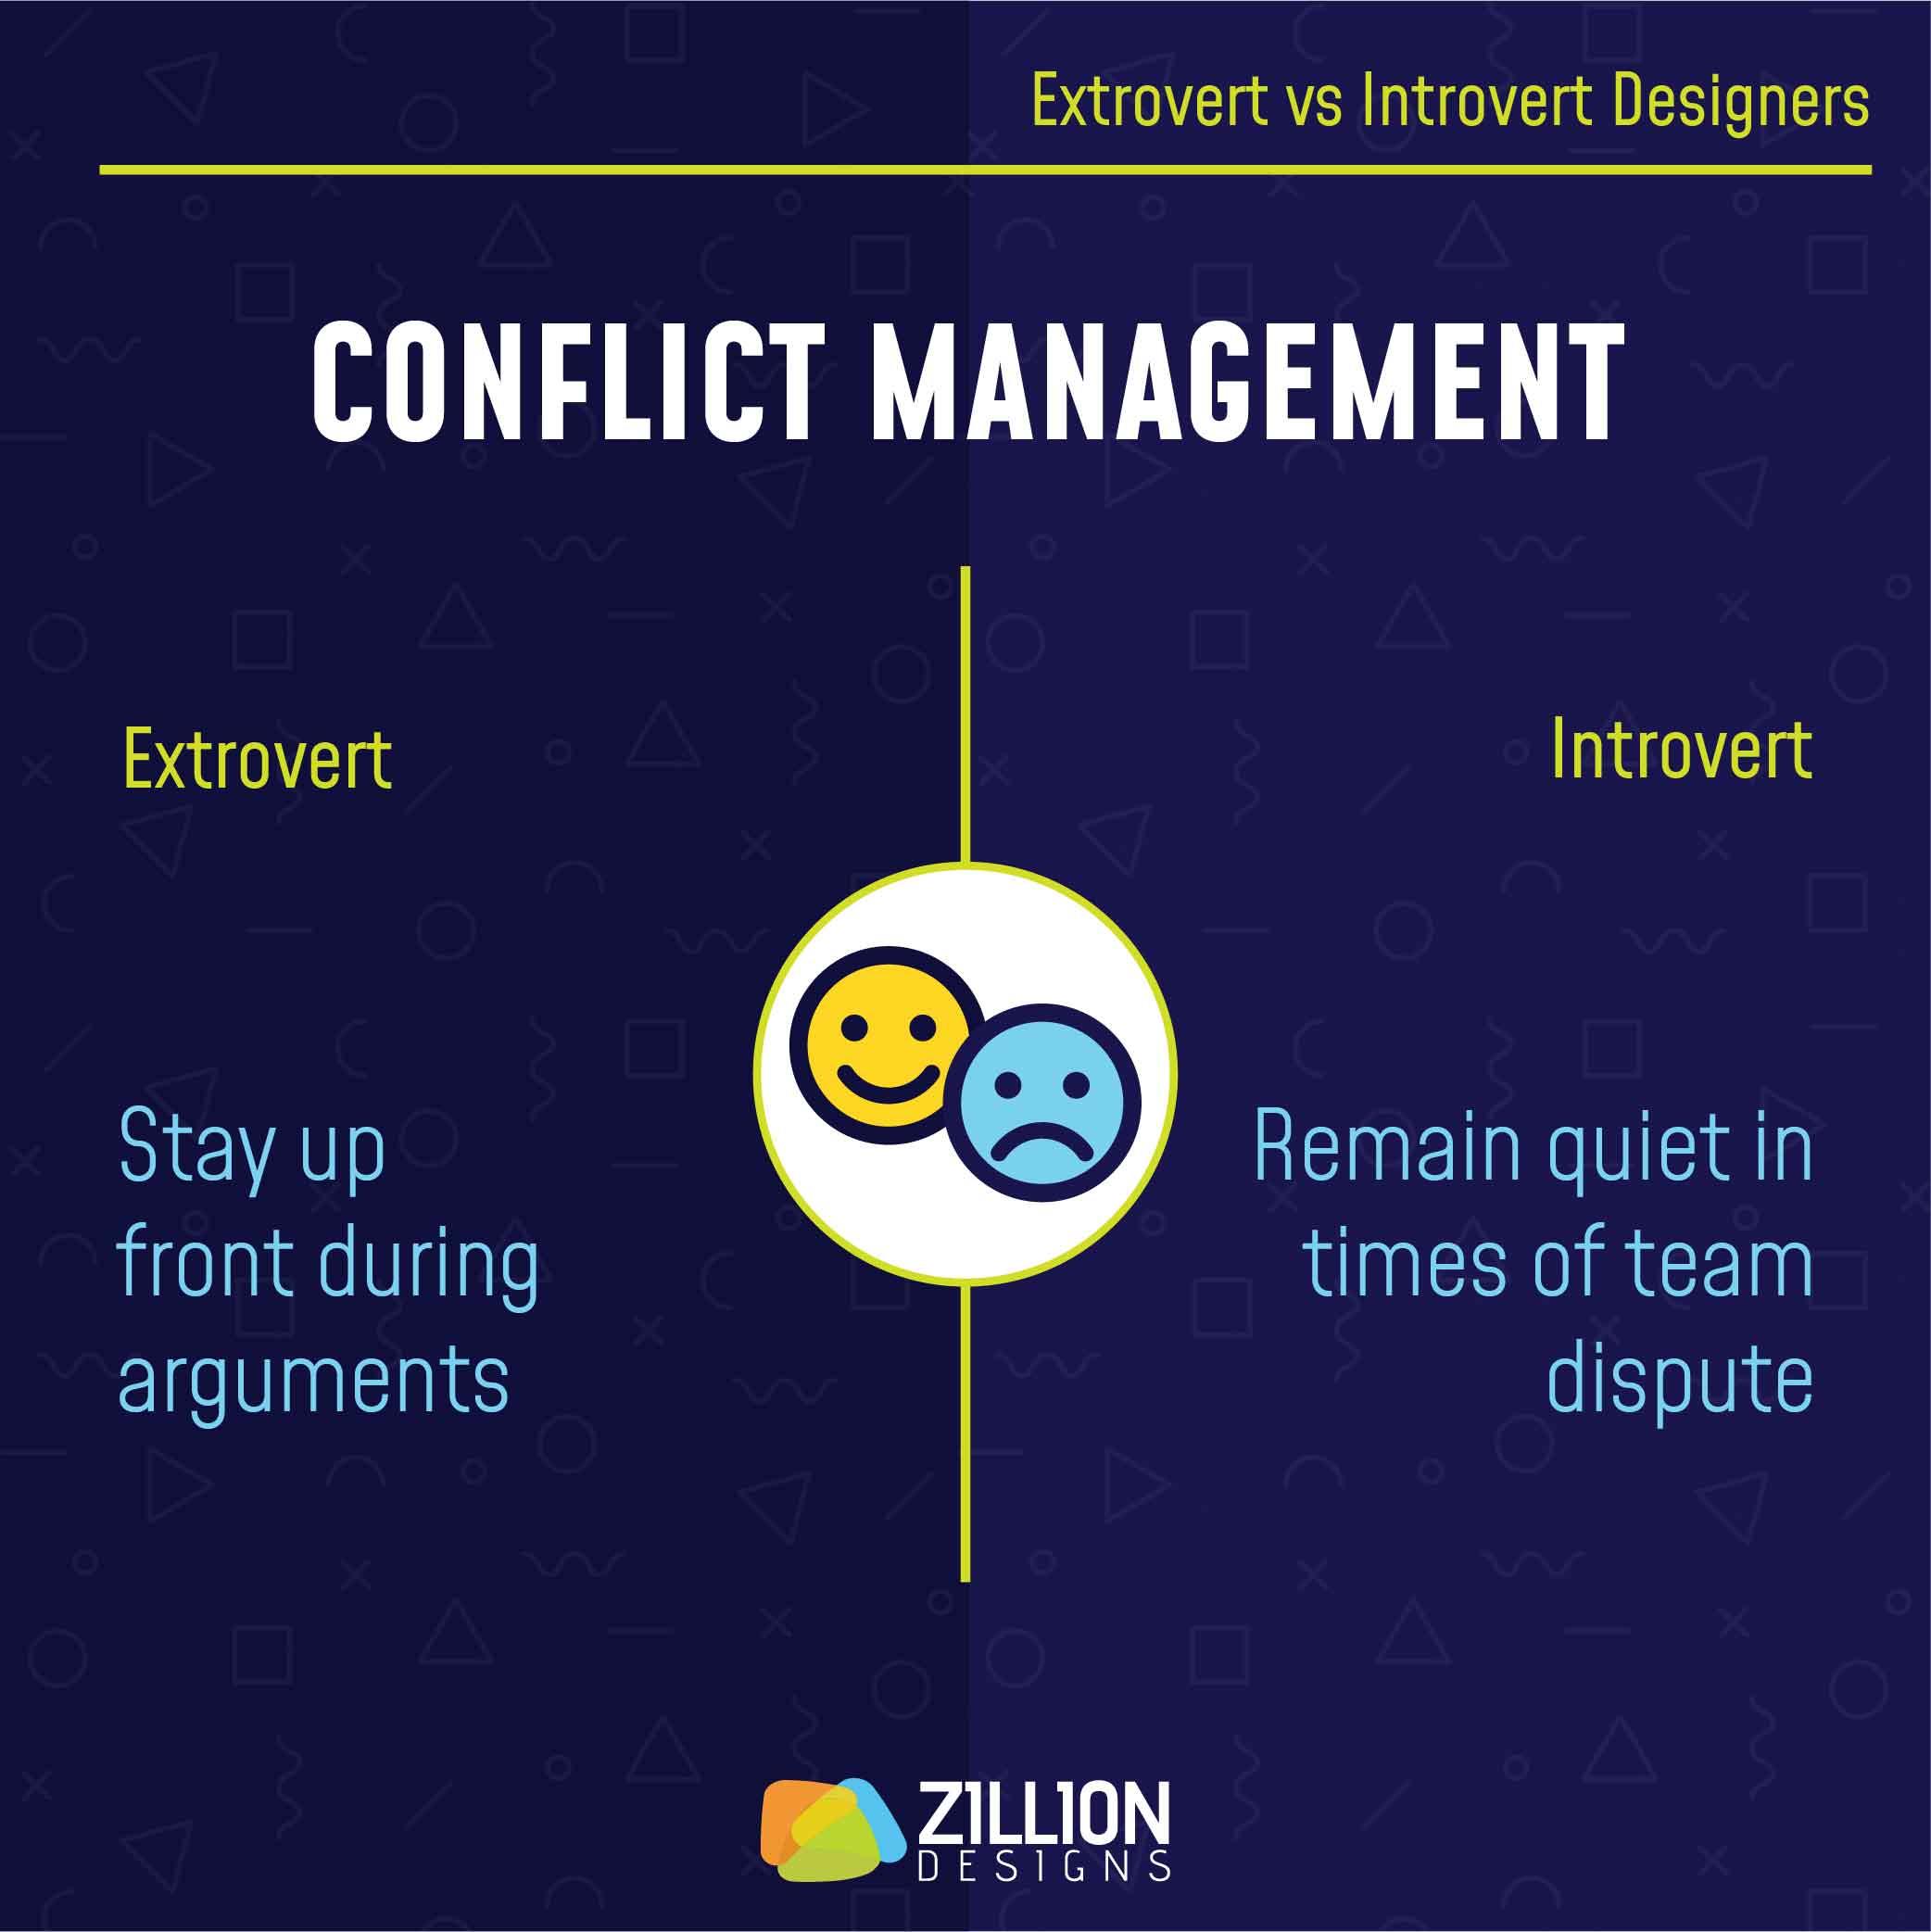 Extrovert vs Introvert Designers 4